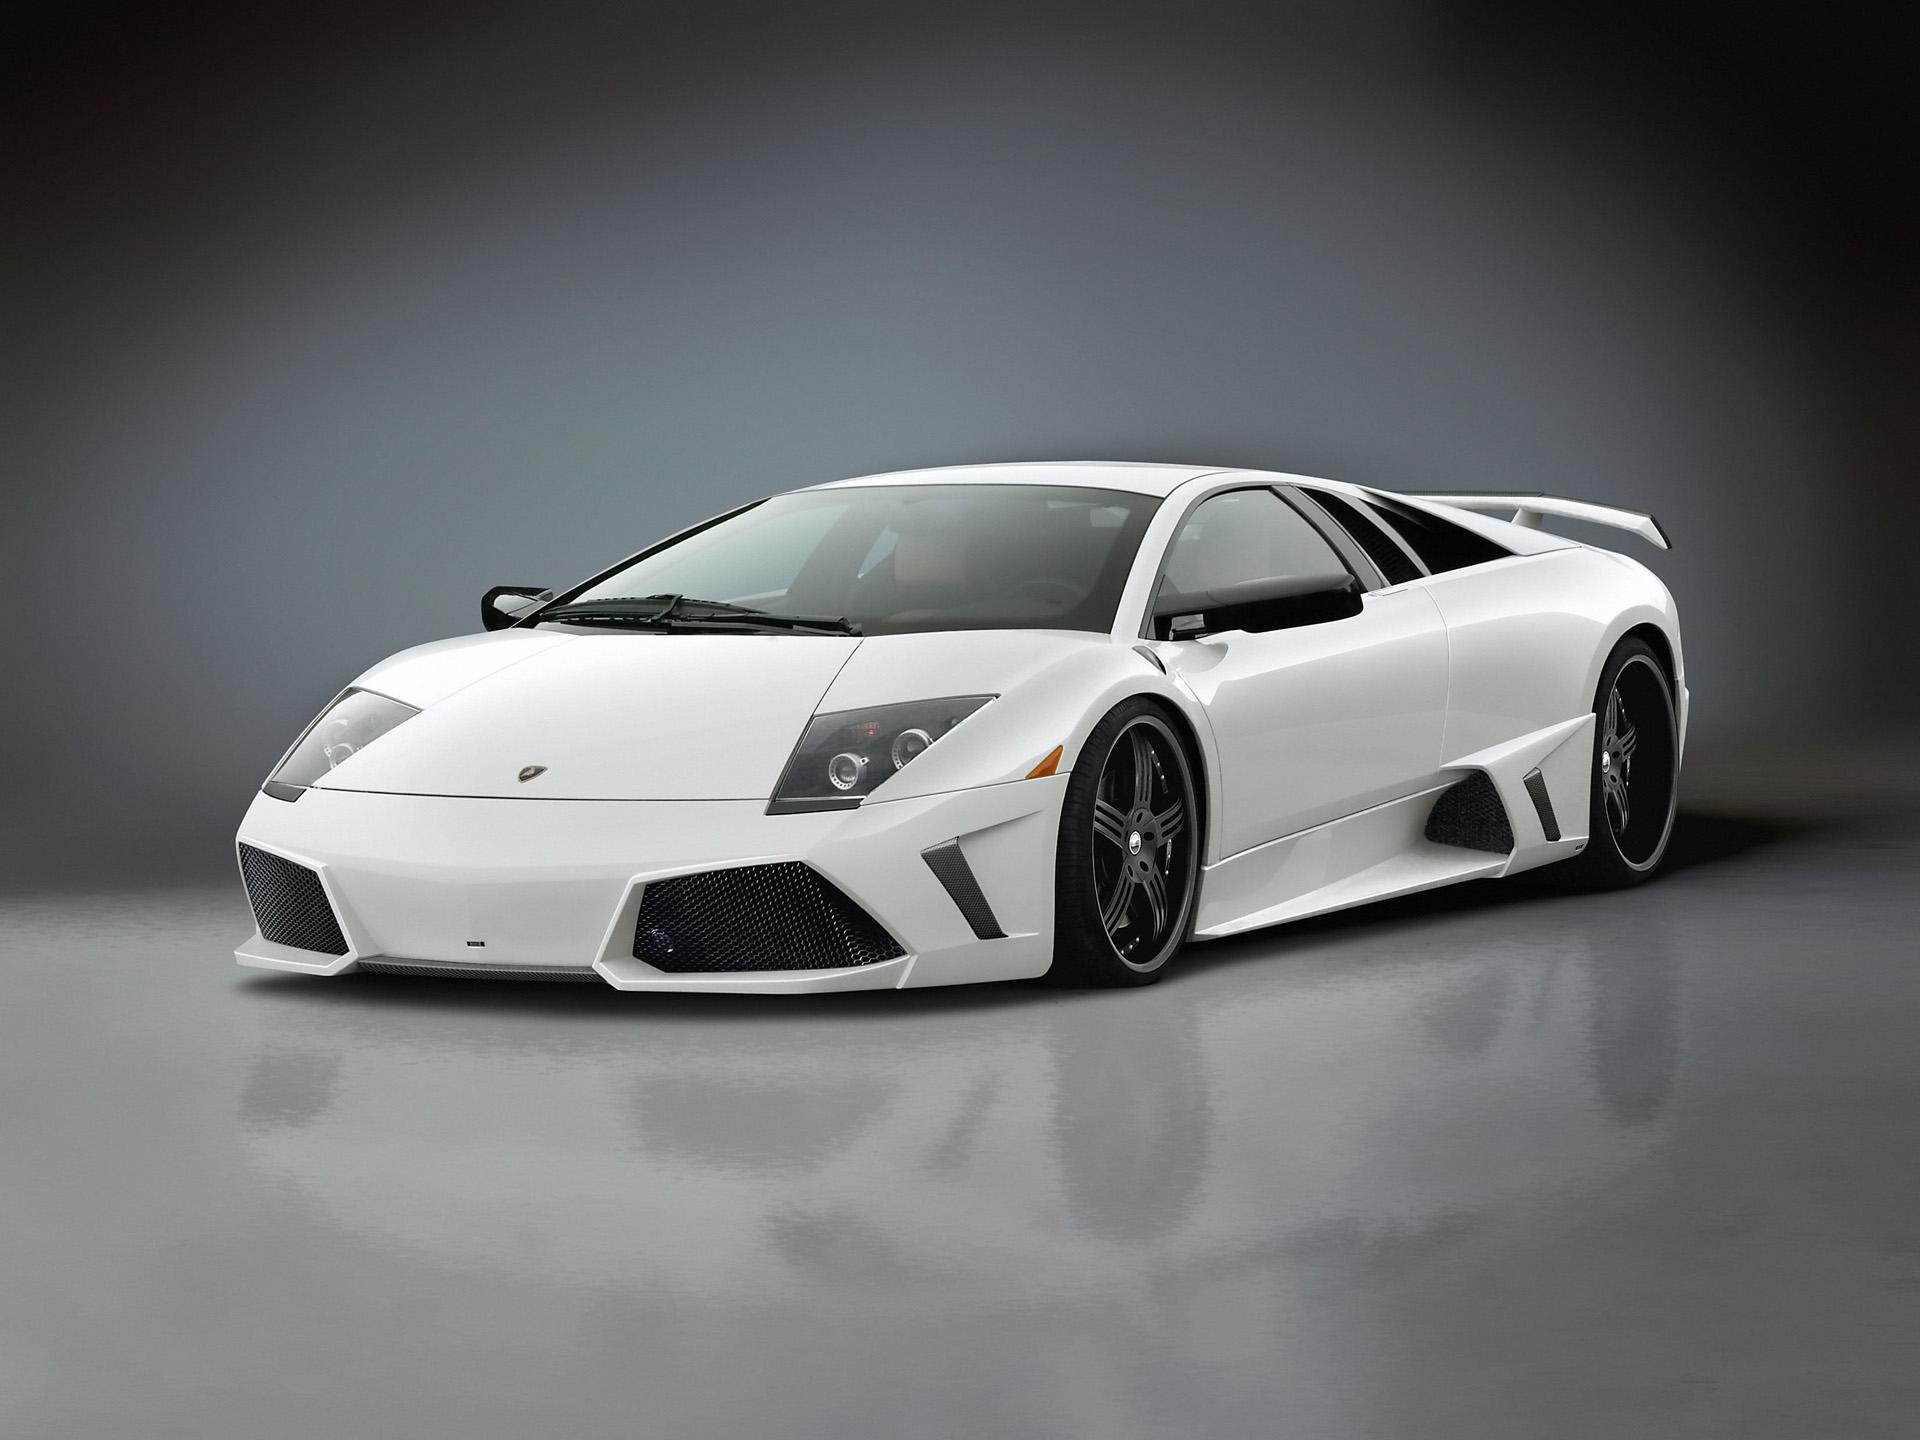 Lamborghini Murcielago Review And Photos